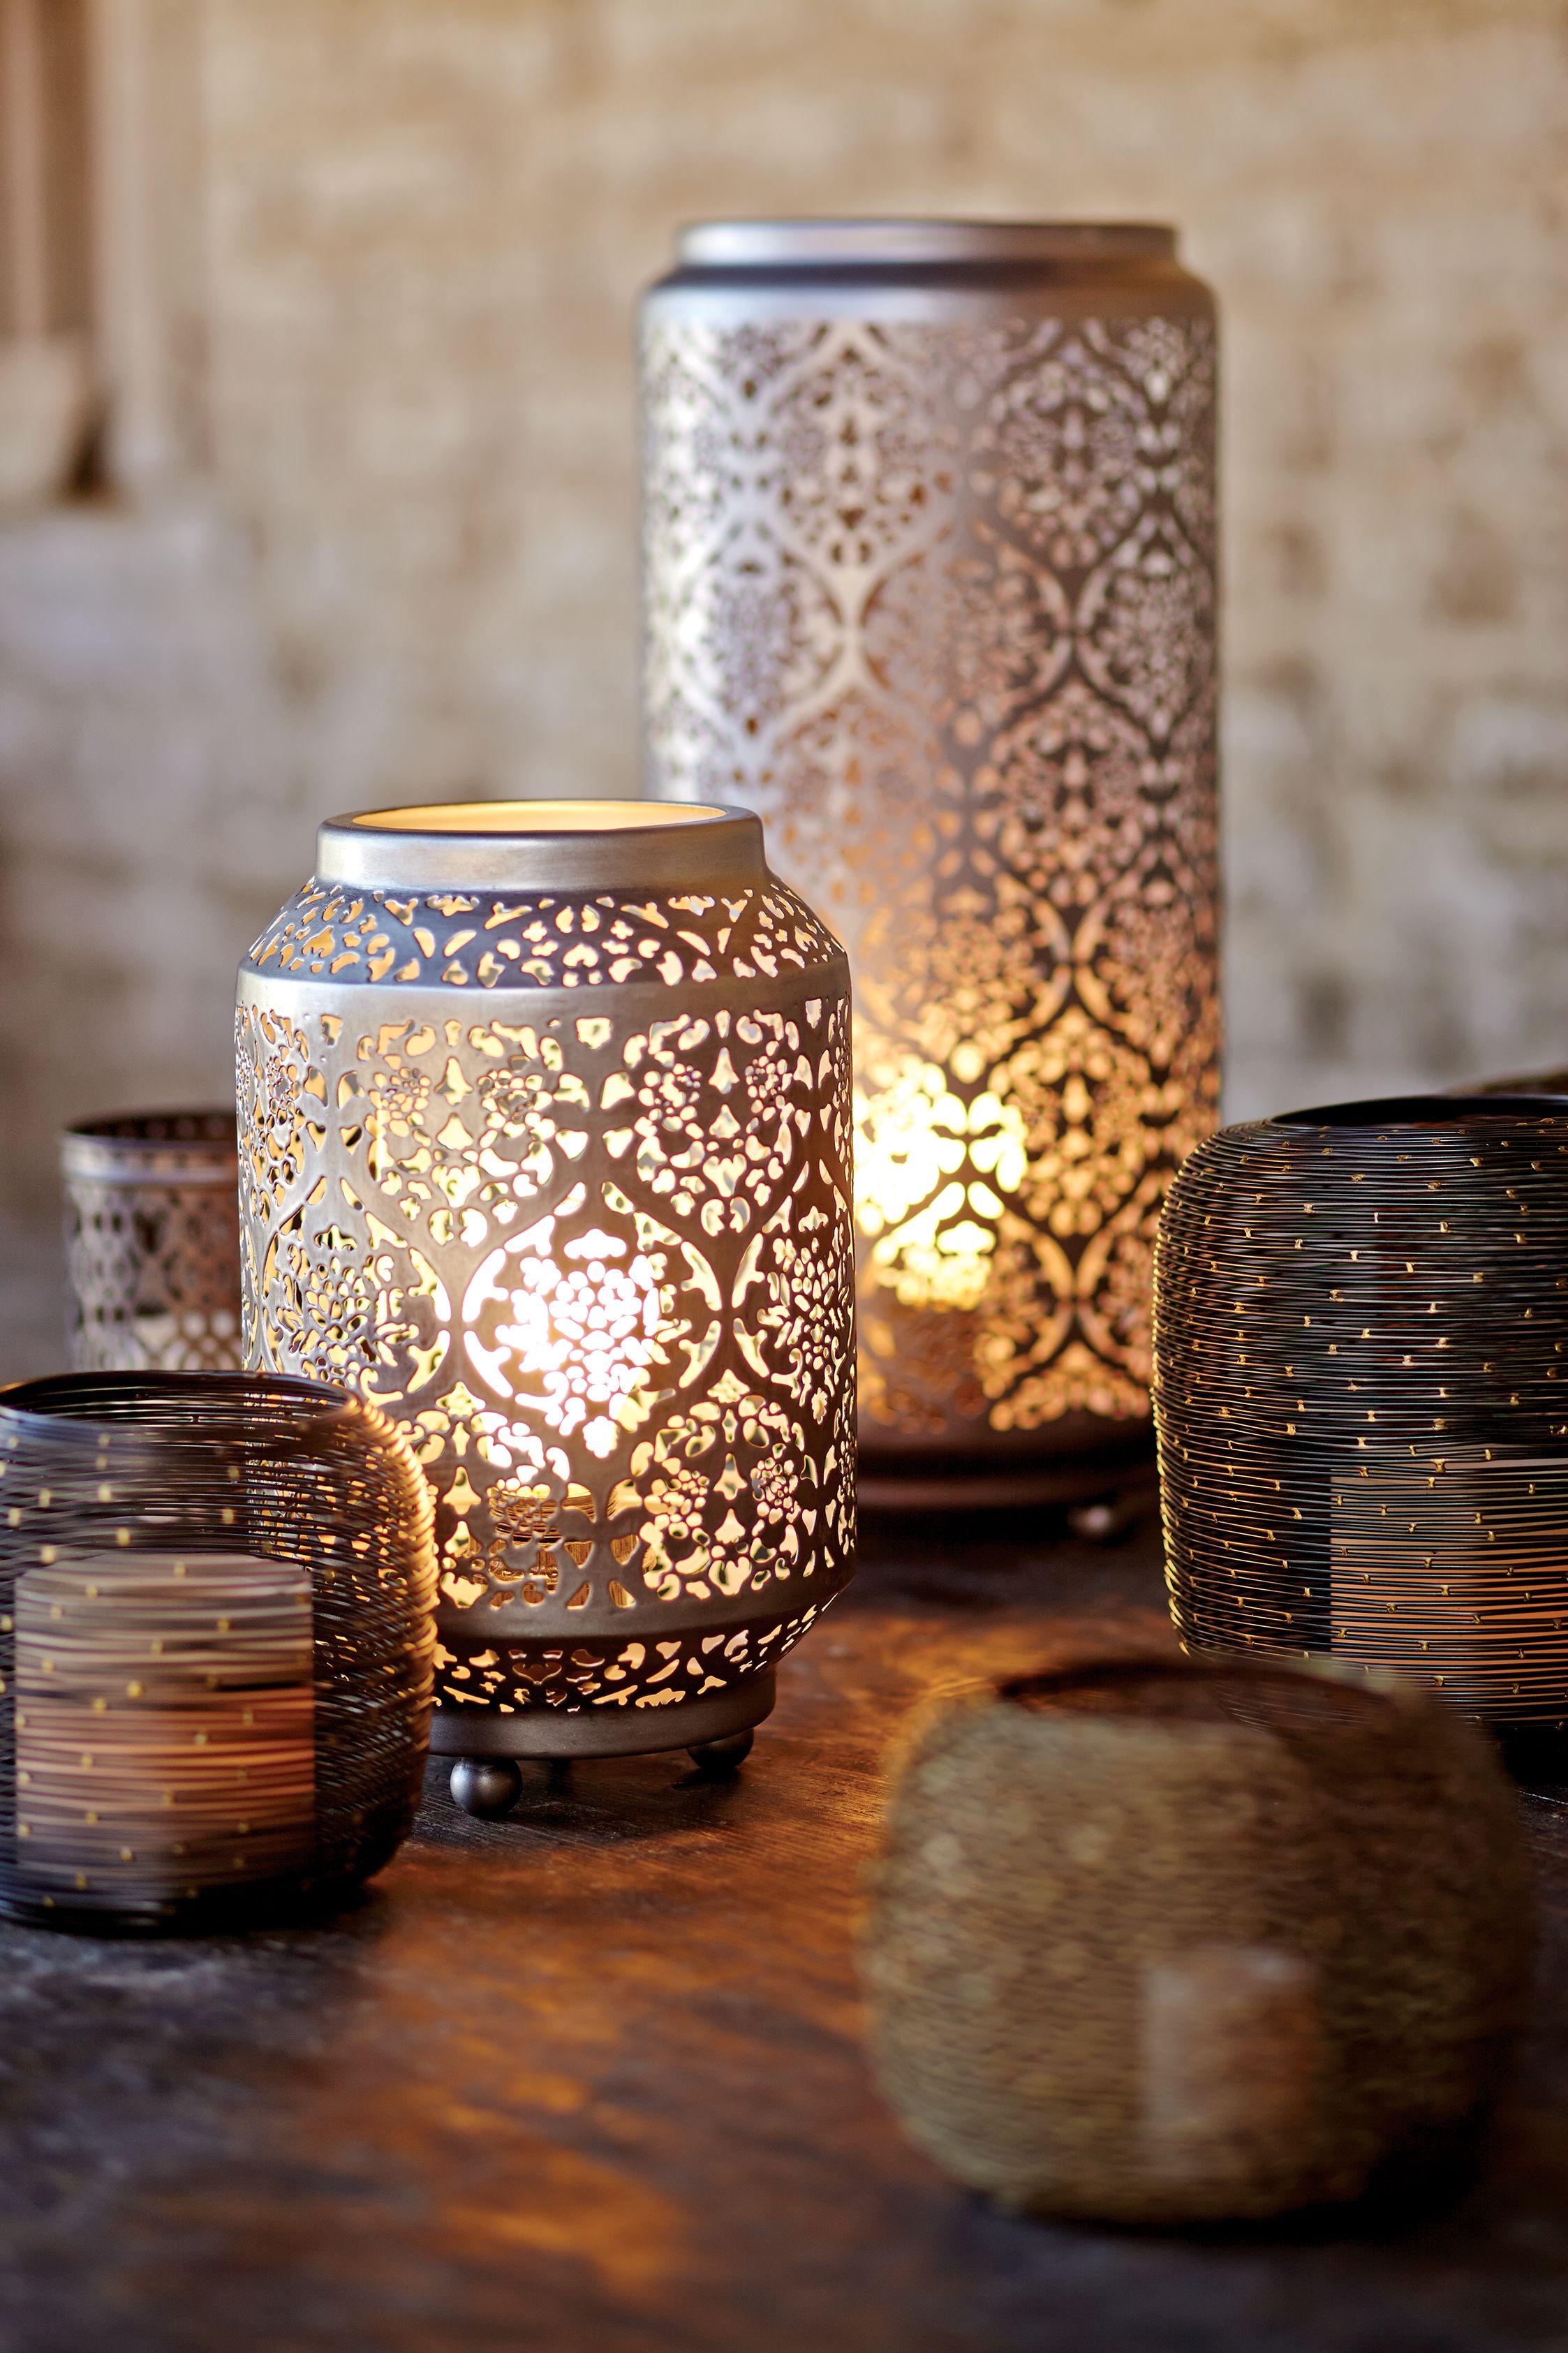 New Desert Caravan Collection Featuring Cost Plus World Marketu0027s Baroque  Cylinder Punched Metal Accent Lamp U003eu003e #WorldMarket Home Decor Ideas